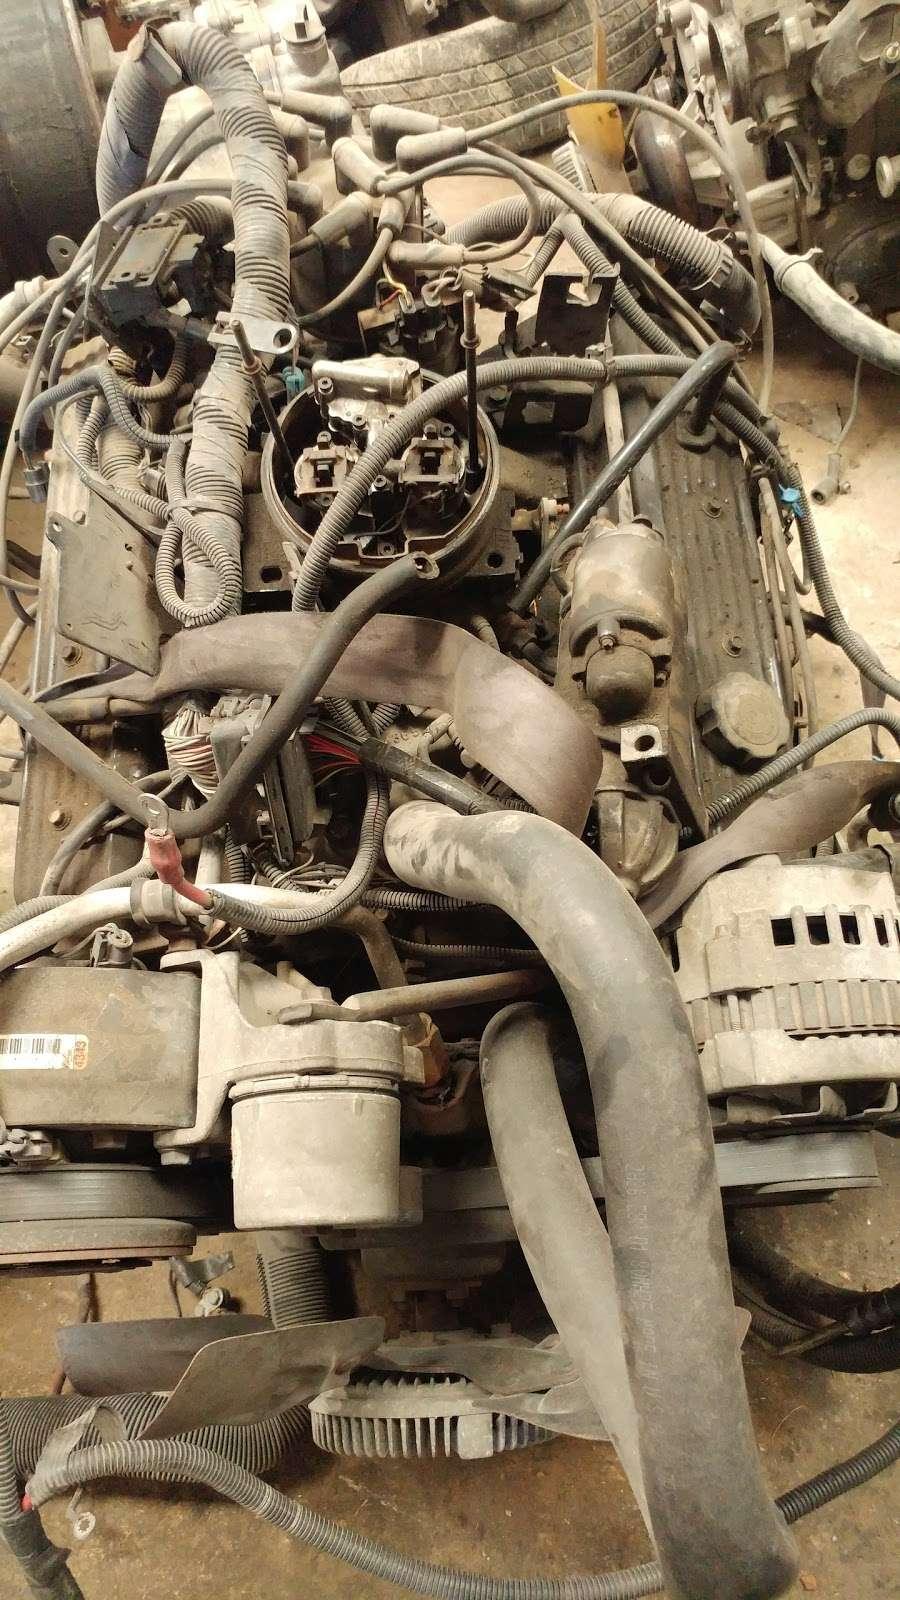 J&B Used Auto Parts - car repair  | Photo 7 of 10 | Address: 6401 E Mt Houston Rd, Houston, TX 77050, USA | Phone: (281) 590-9211